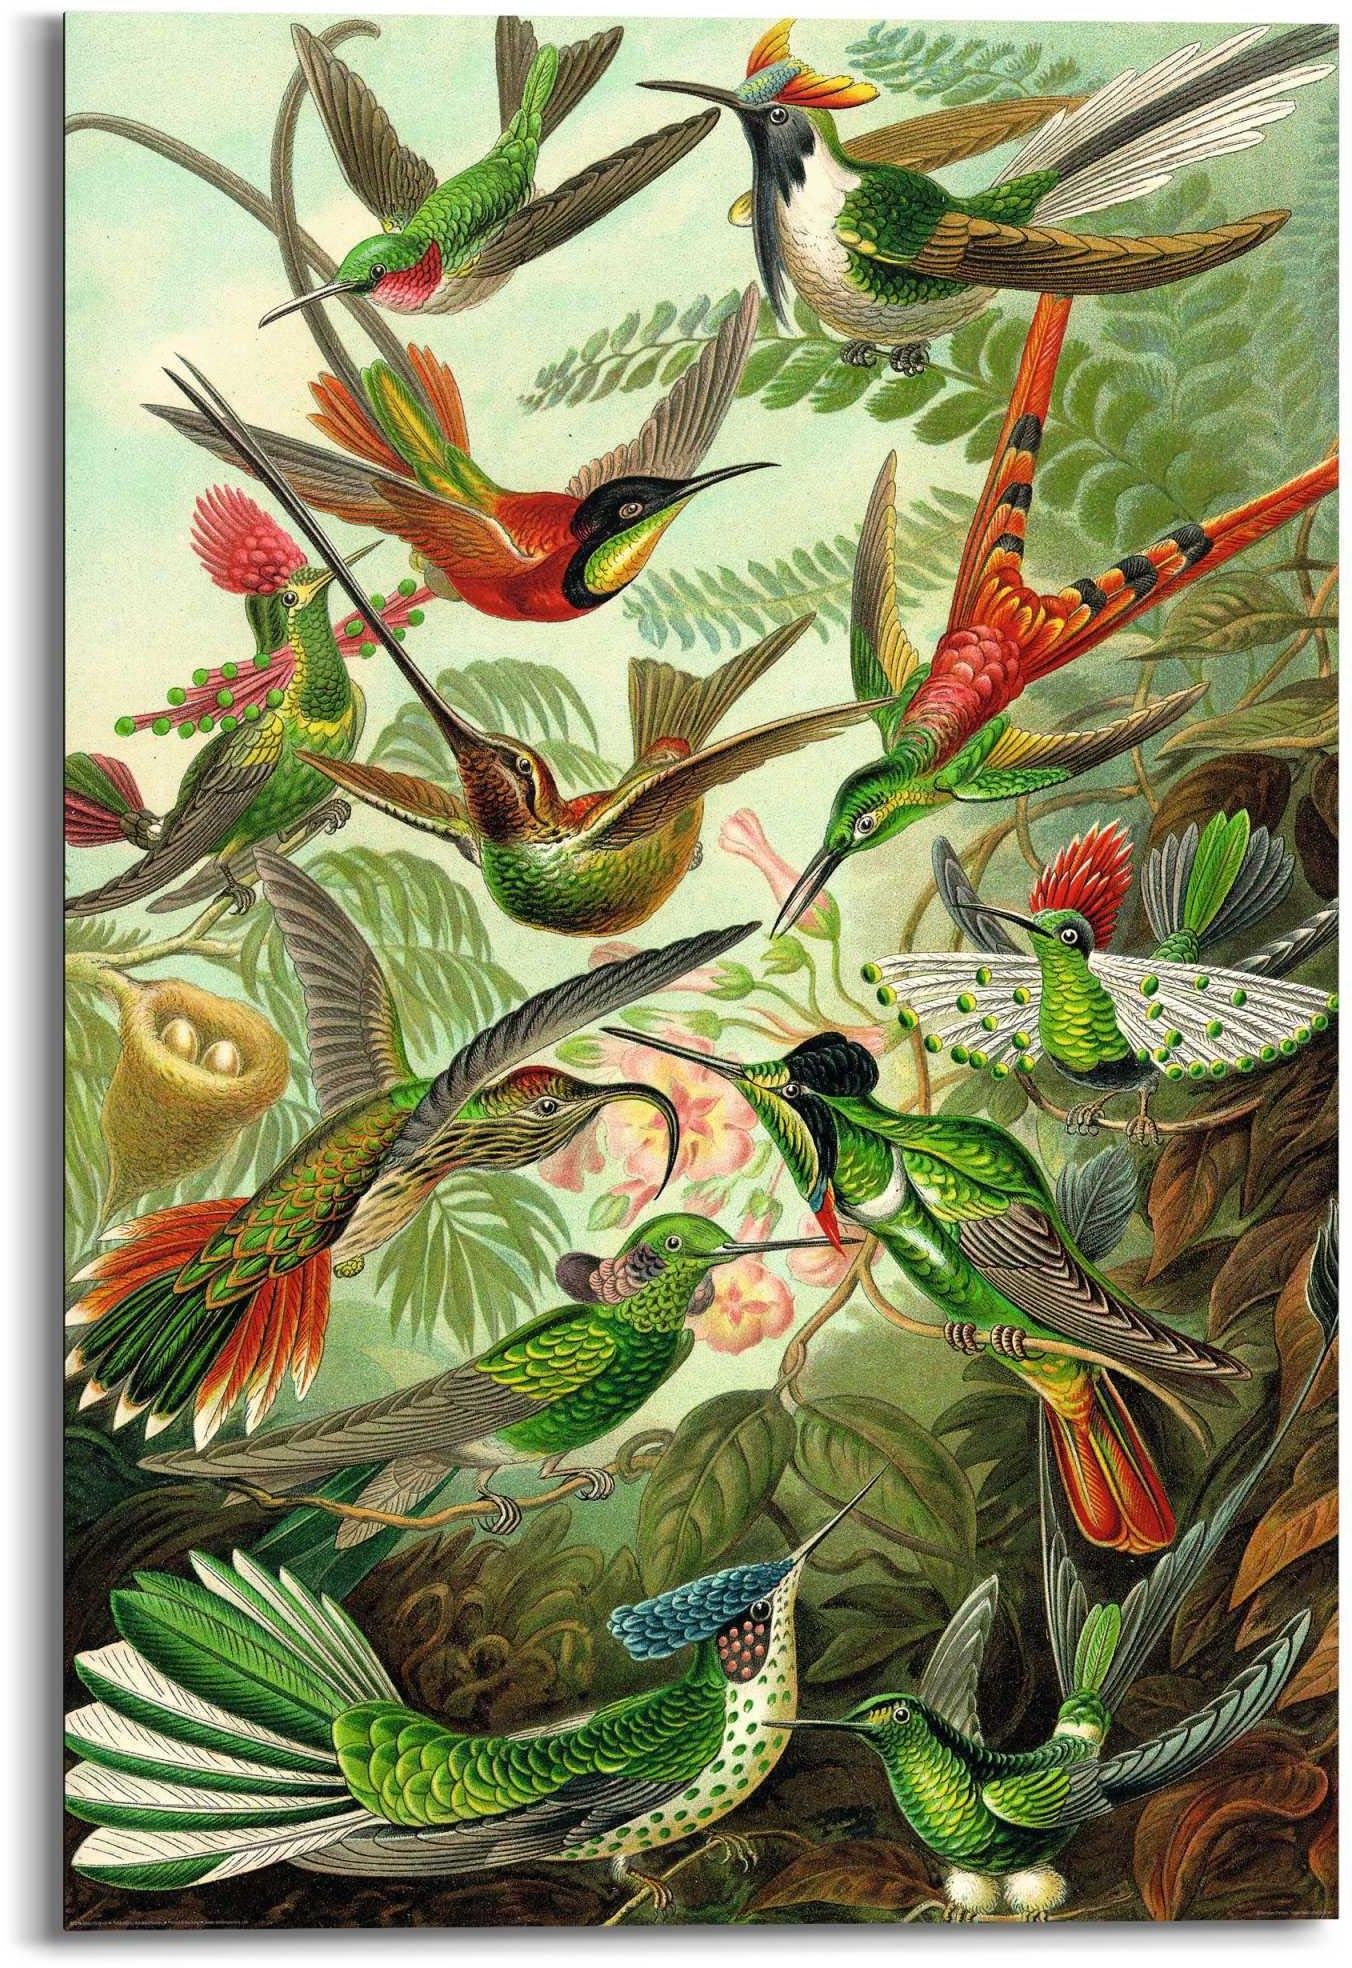 Reinders! artprint Wandbild Hummingbirds Vogel - Tiermotiv - Natur - Botanisch (1 stuk) - verschillende betaalmethodes